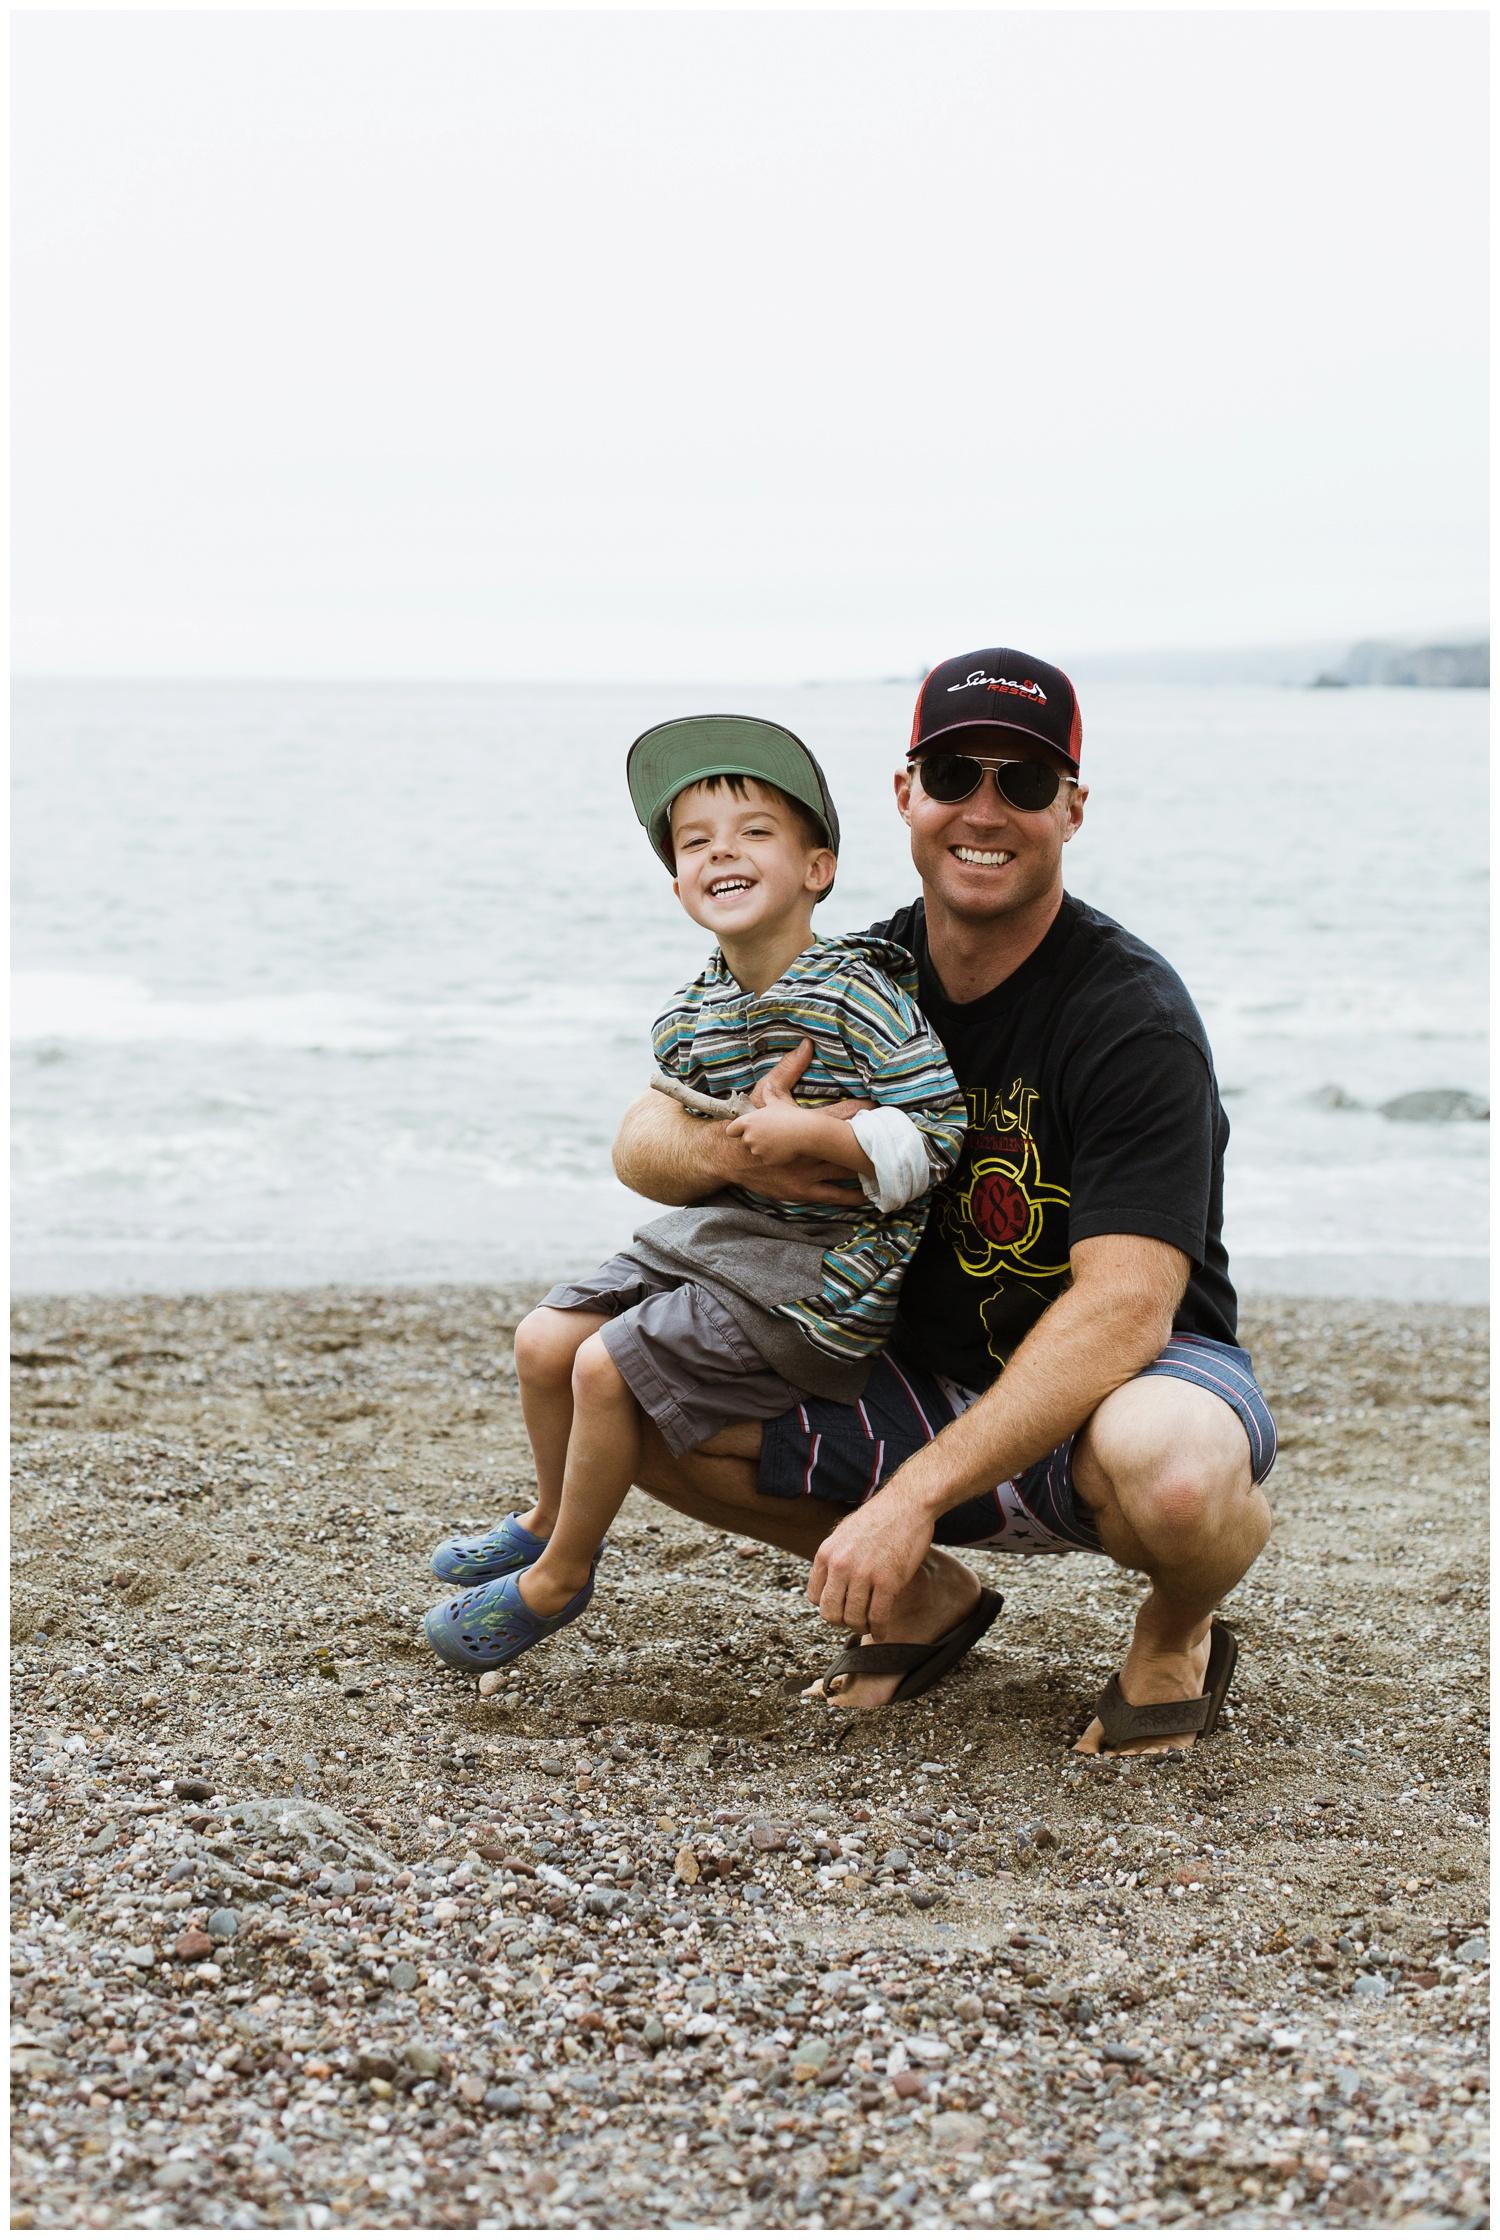 Beach fun with Daddy!